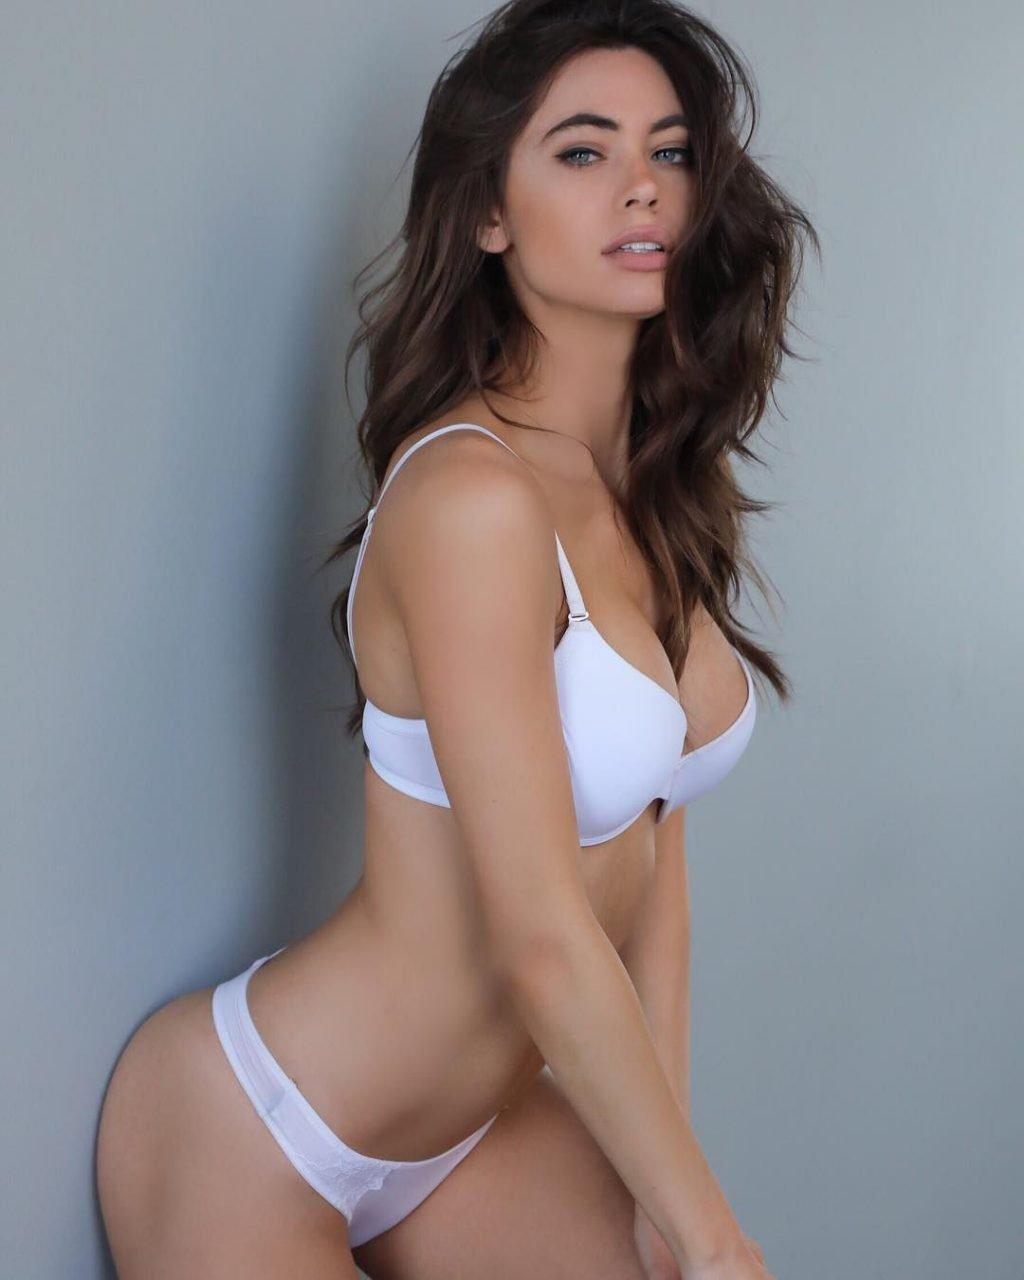 Kelly seymour nude sexy - 2019 year